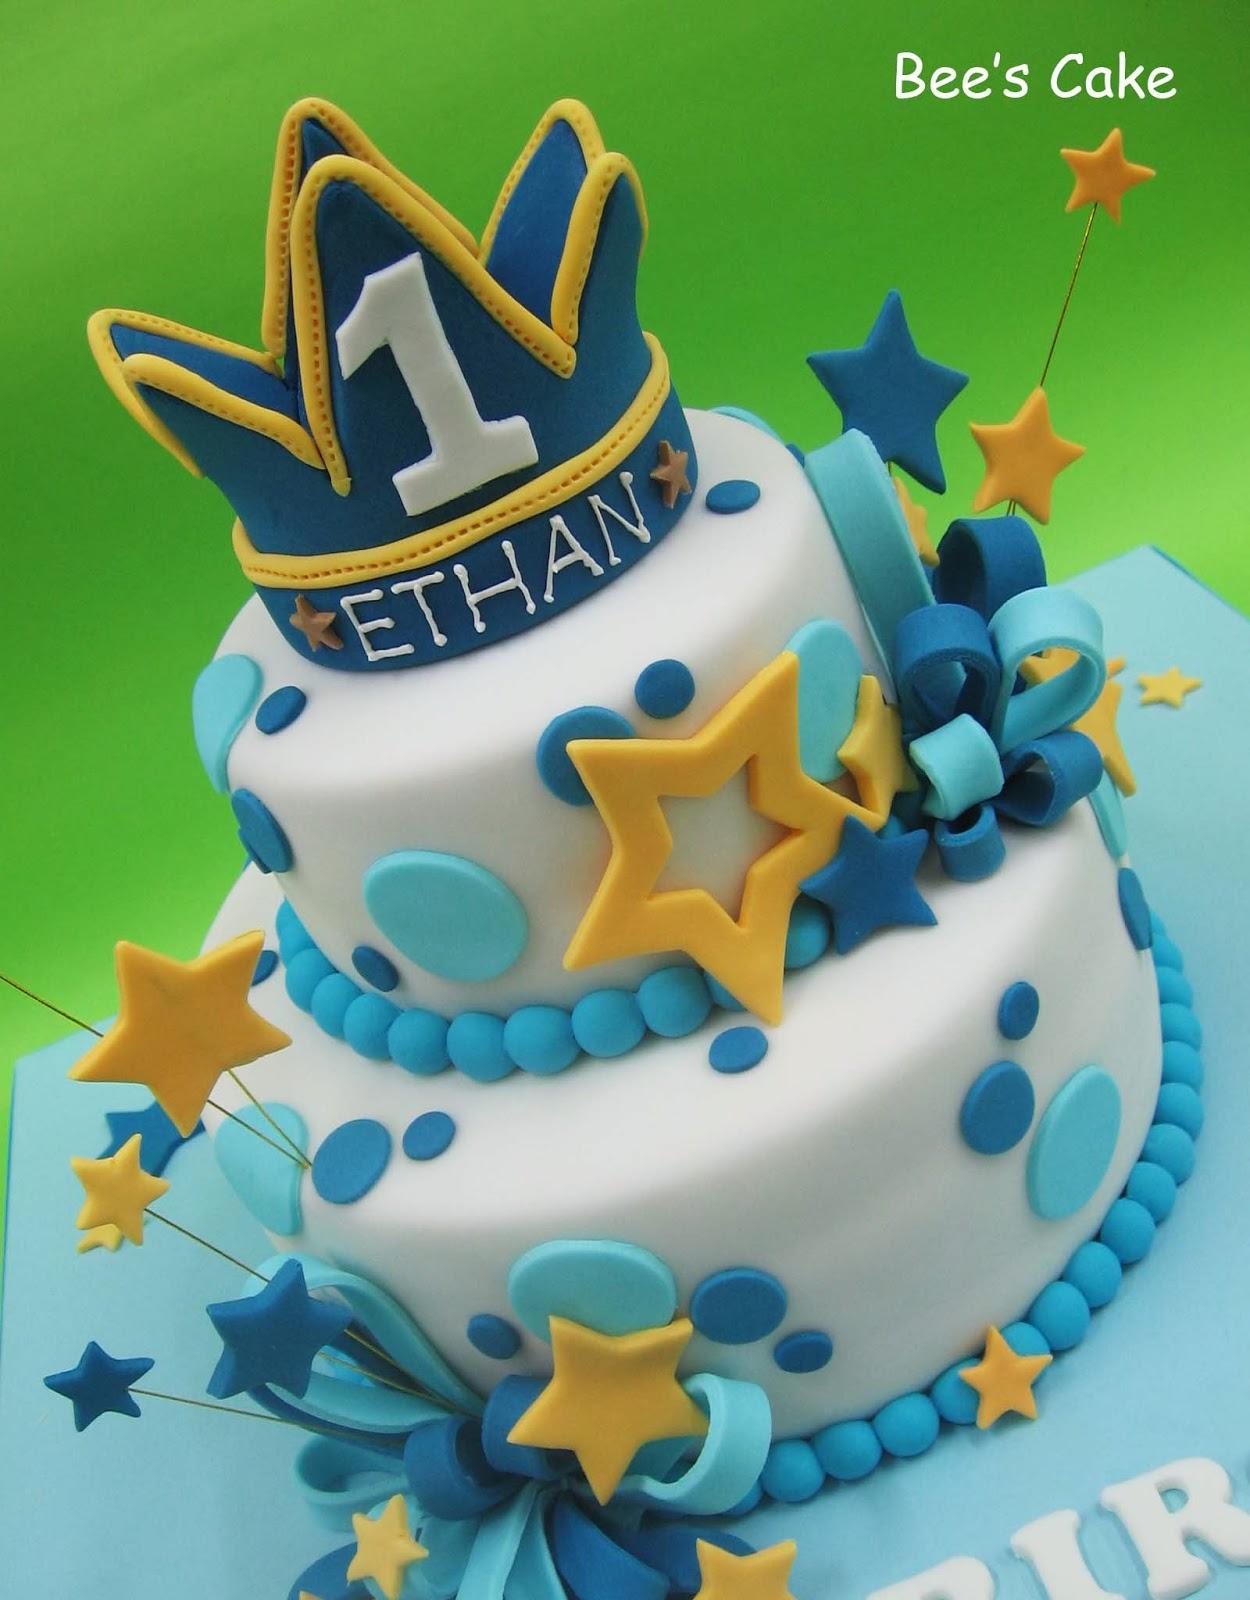 Bees Cake Prince Ethans 1st Birthday